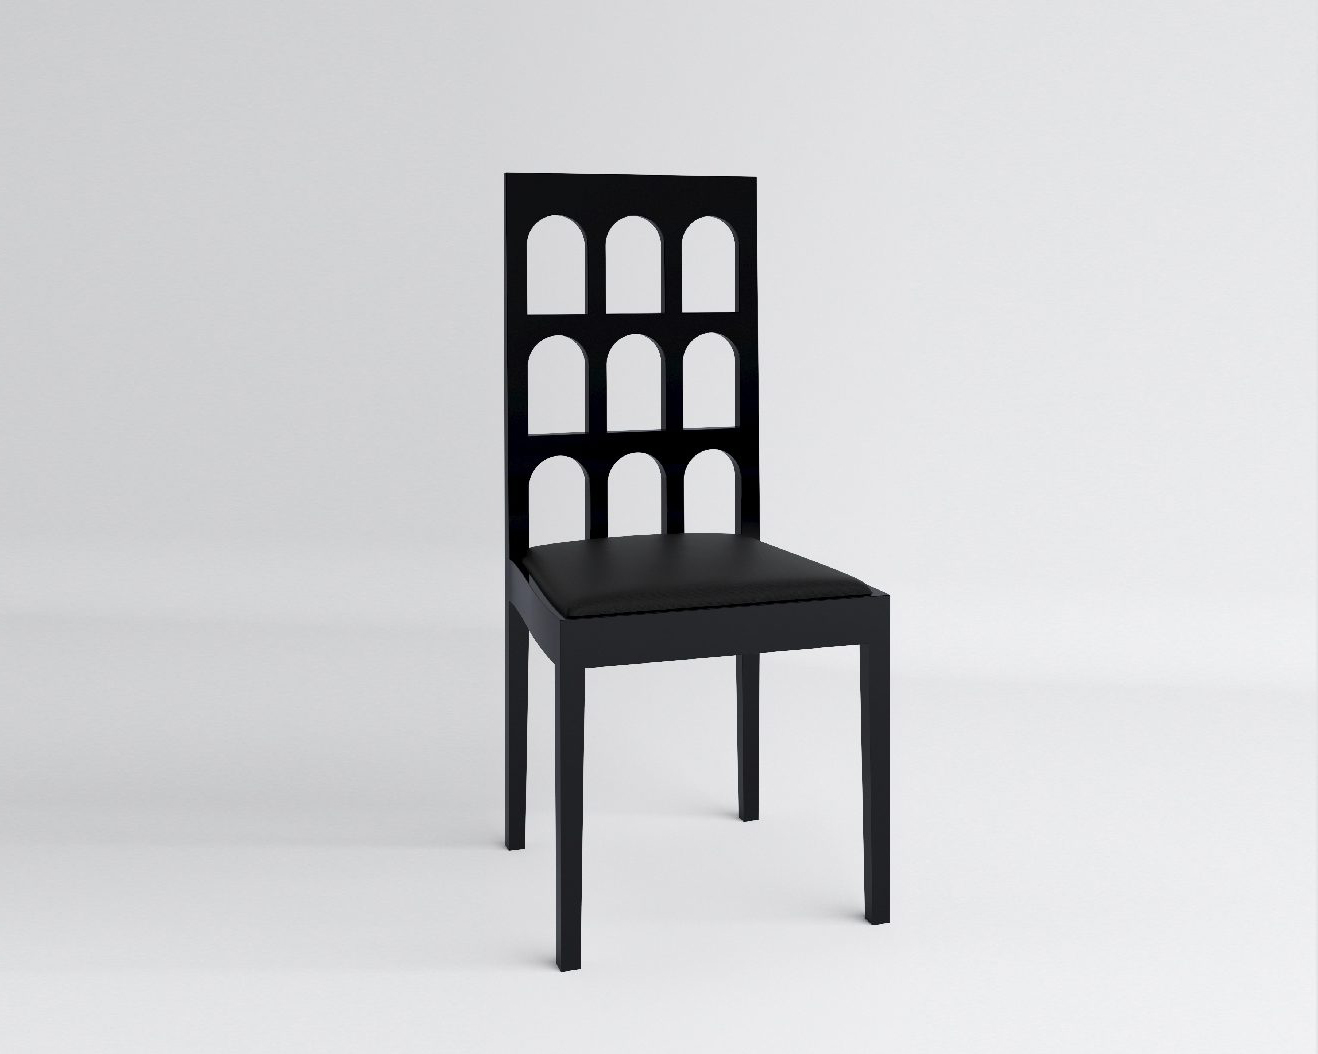 ItalyChair-textile-Dmitry-Samygin-design-savannah-bay